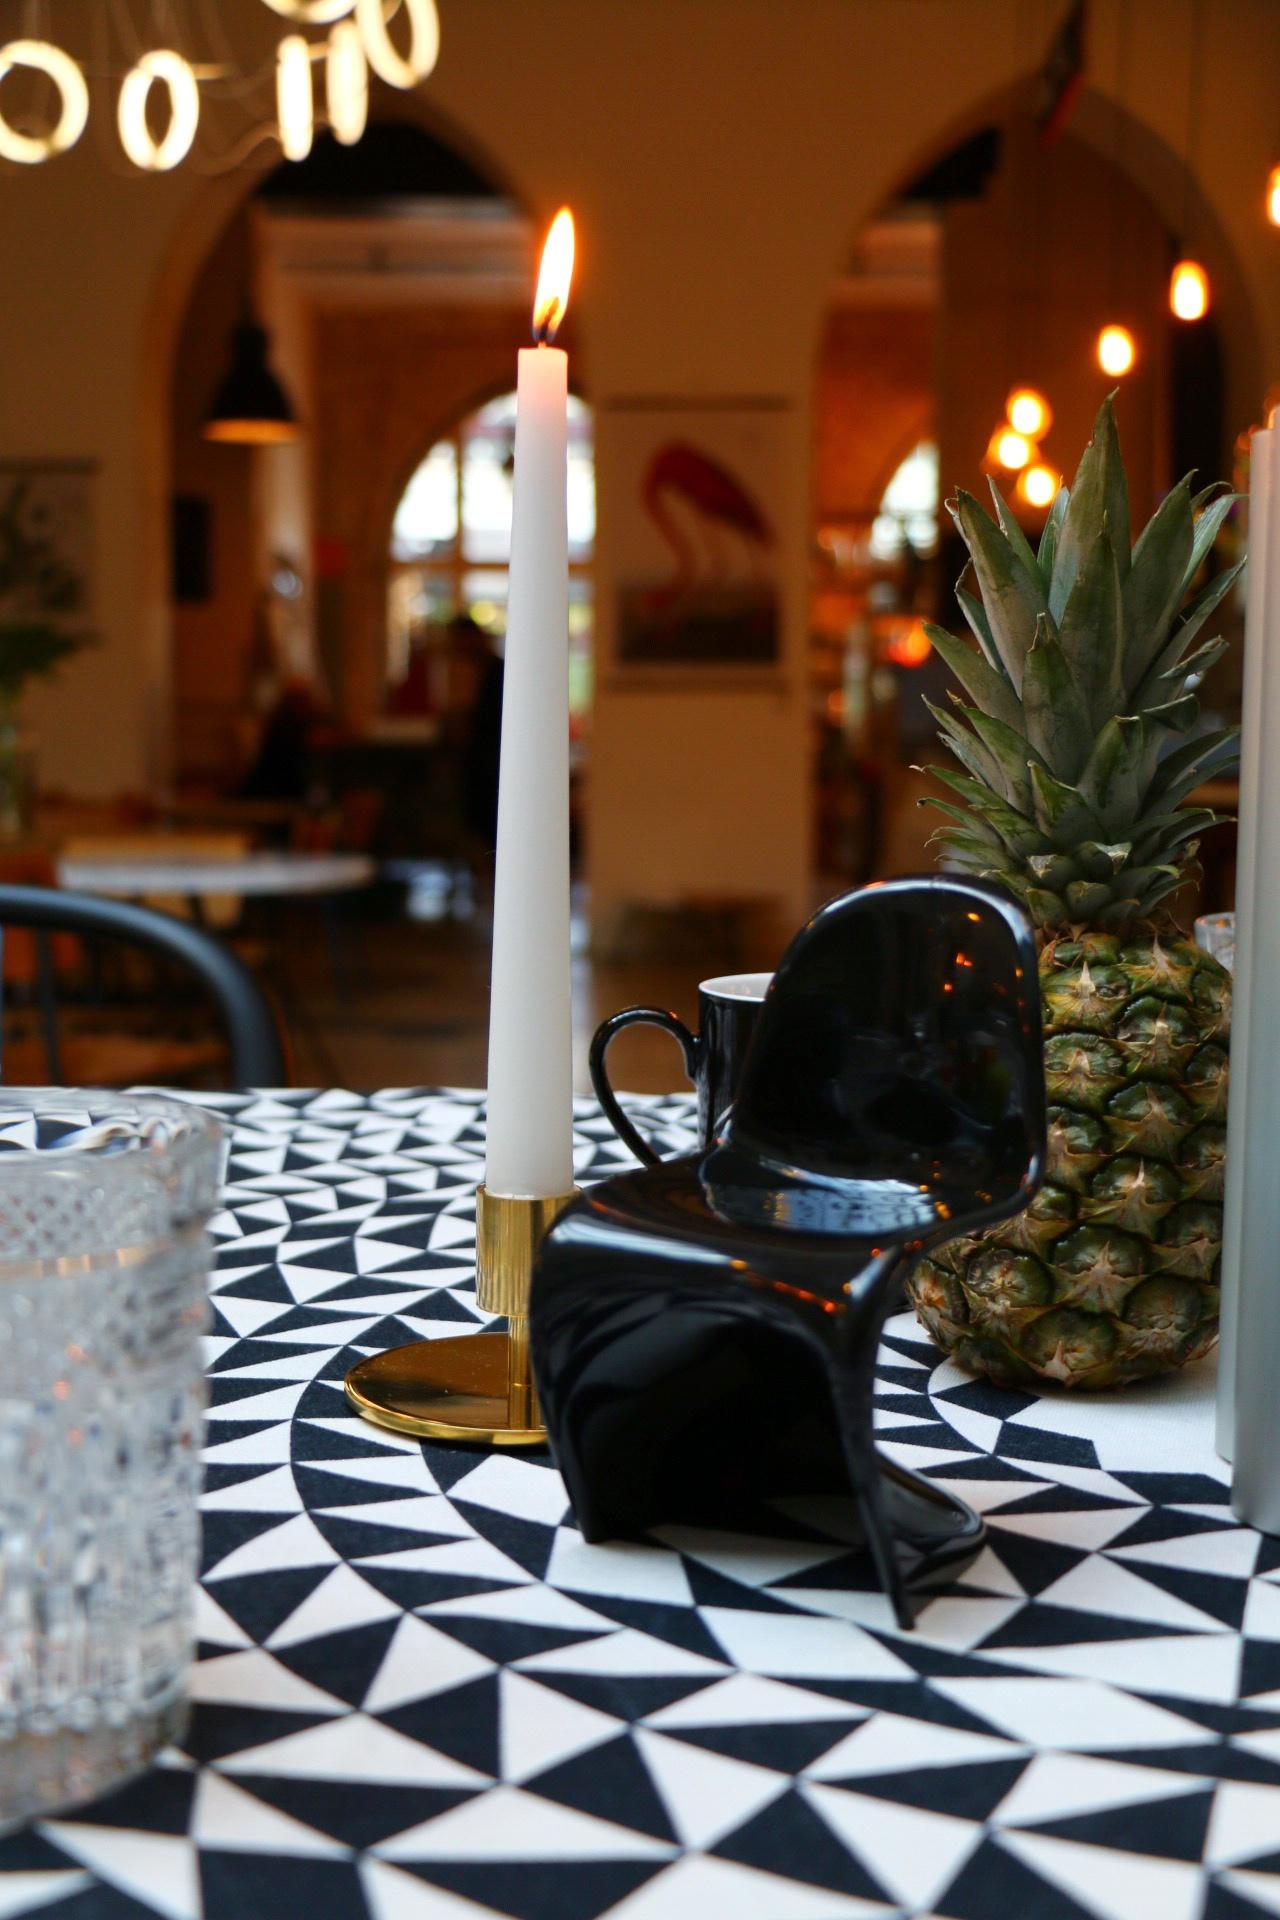 Panton Chair Miniatur - Vitra Summer Dinner in Berlin by eat blog love